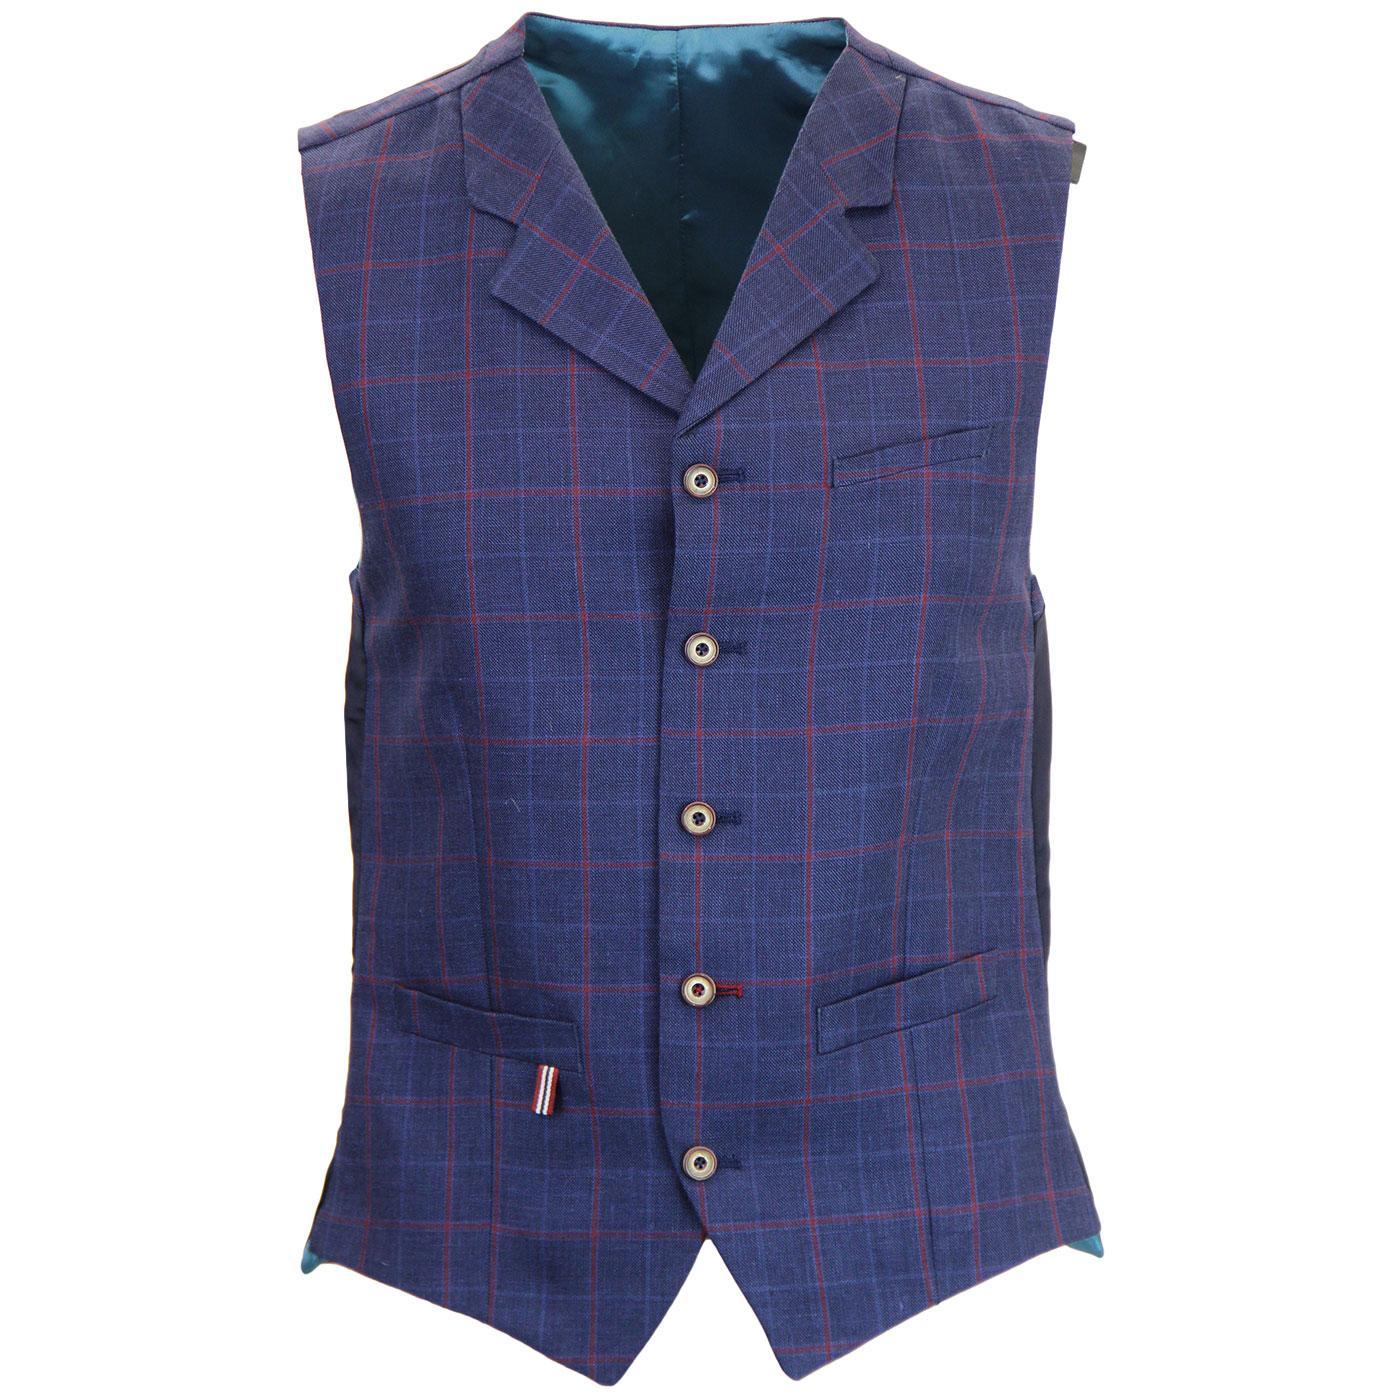 Tyburn GIBSON LONDON Mod Check Linen Waistcoat